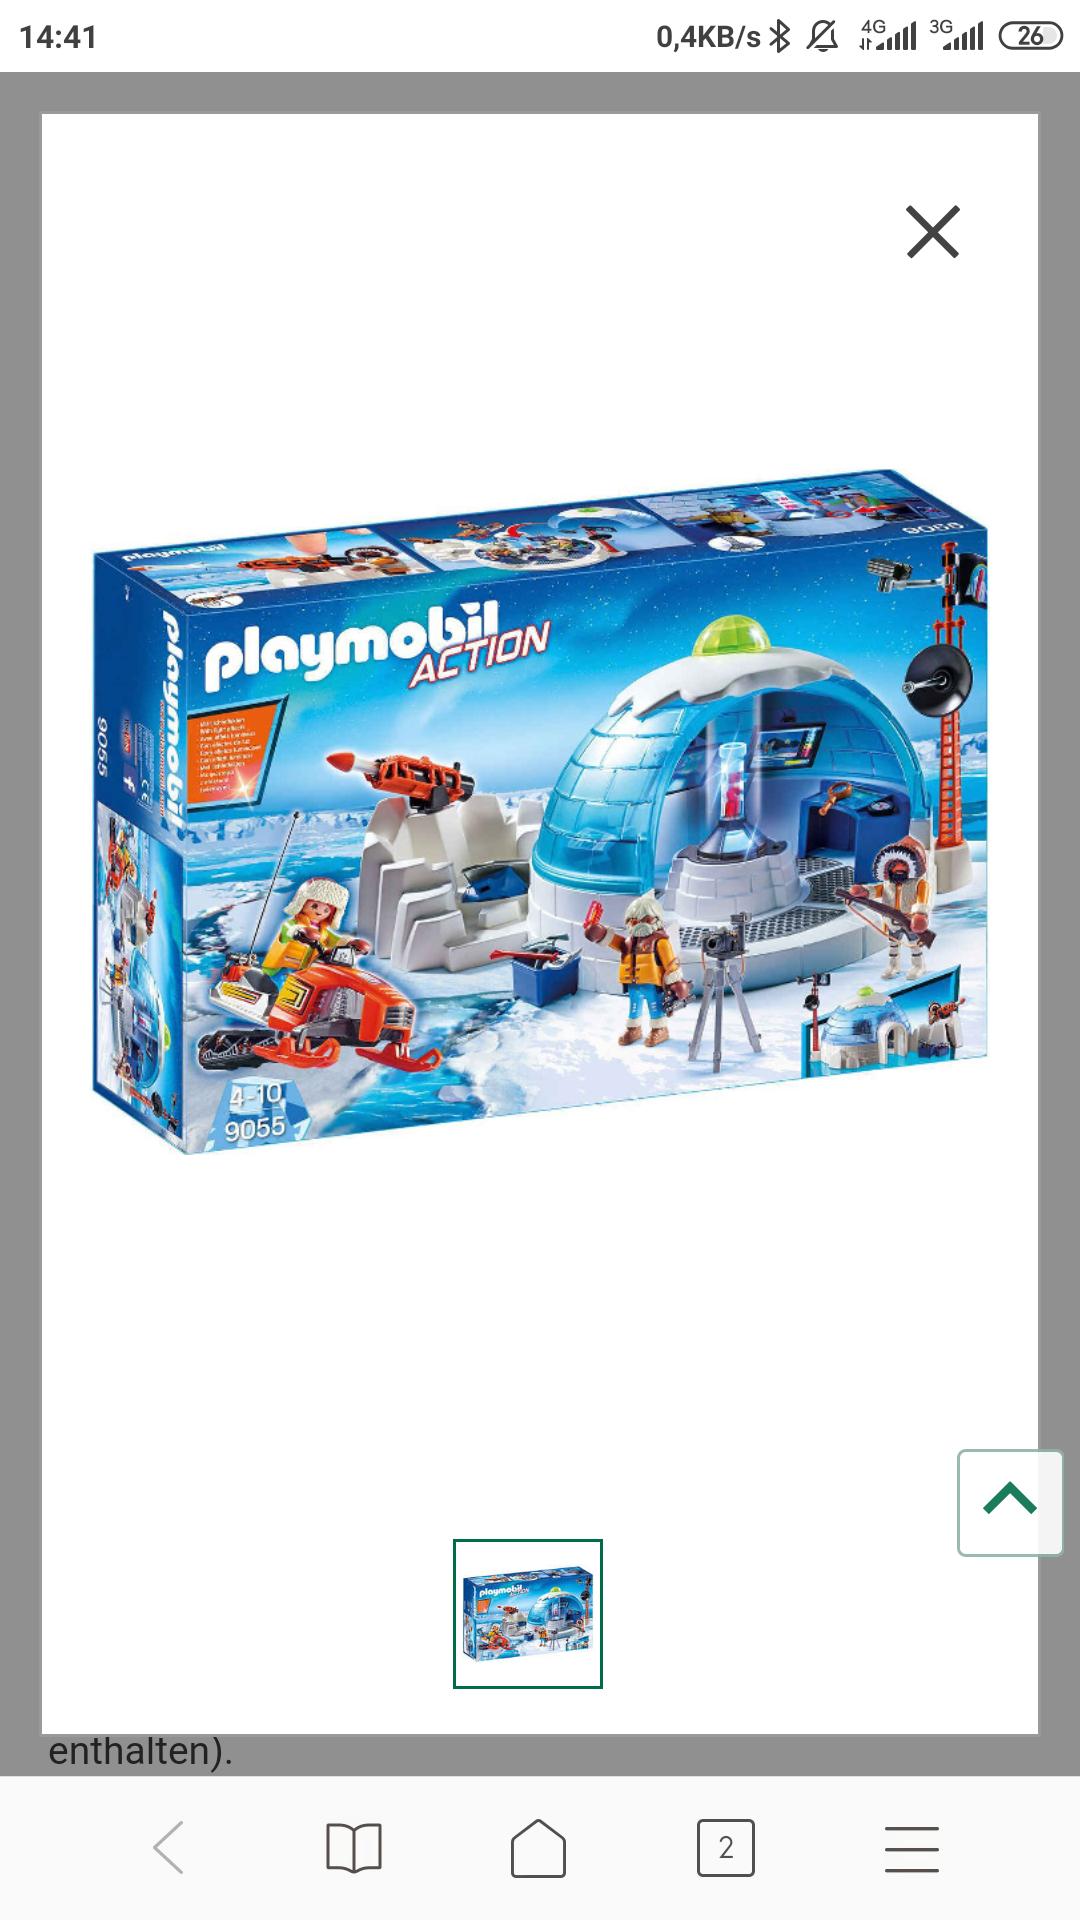 Playmobil Action Polar Ranger Hauptquartier 9055 Kaufhof Spielzeug mit Filialabholung 9,99